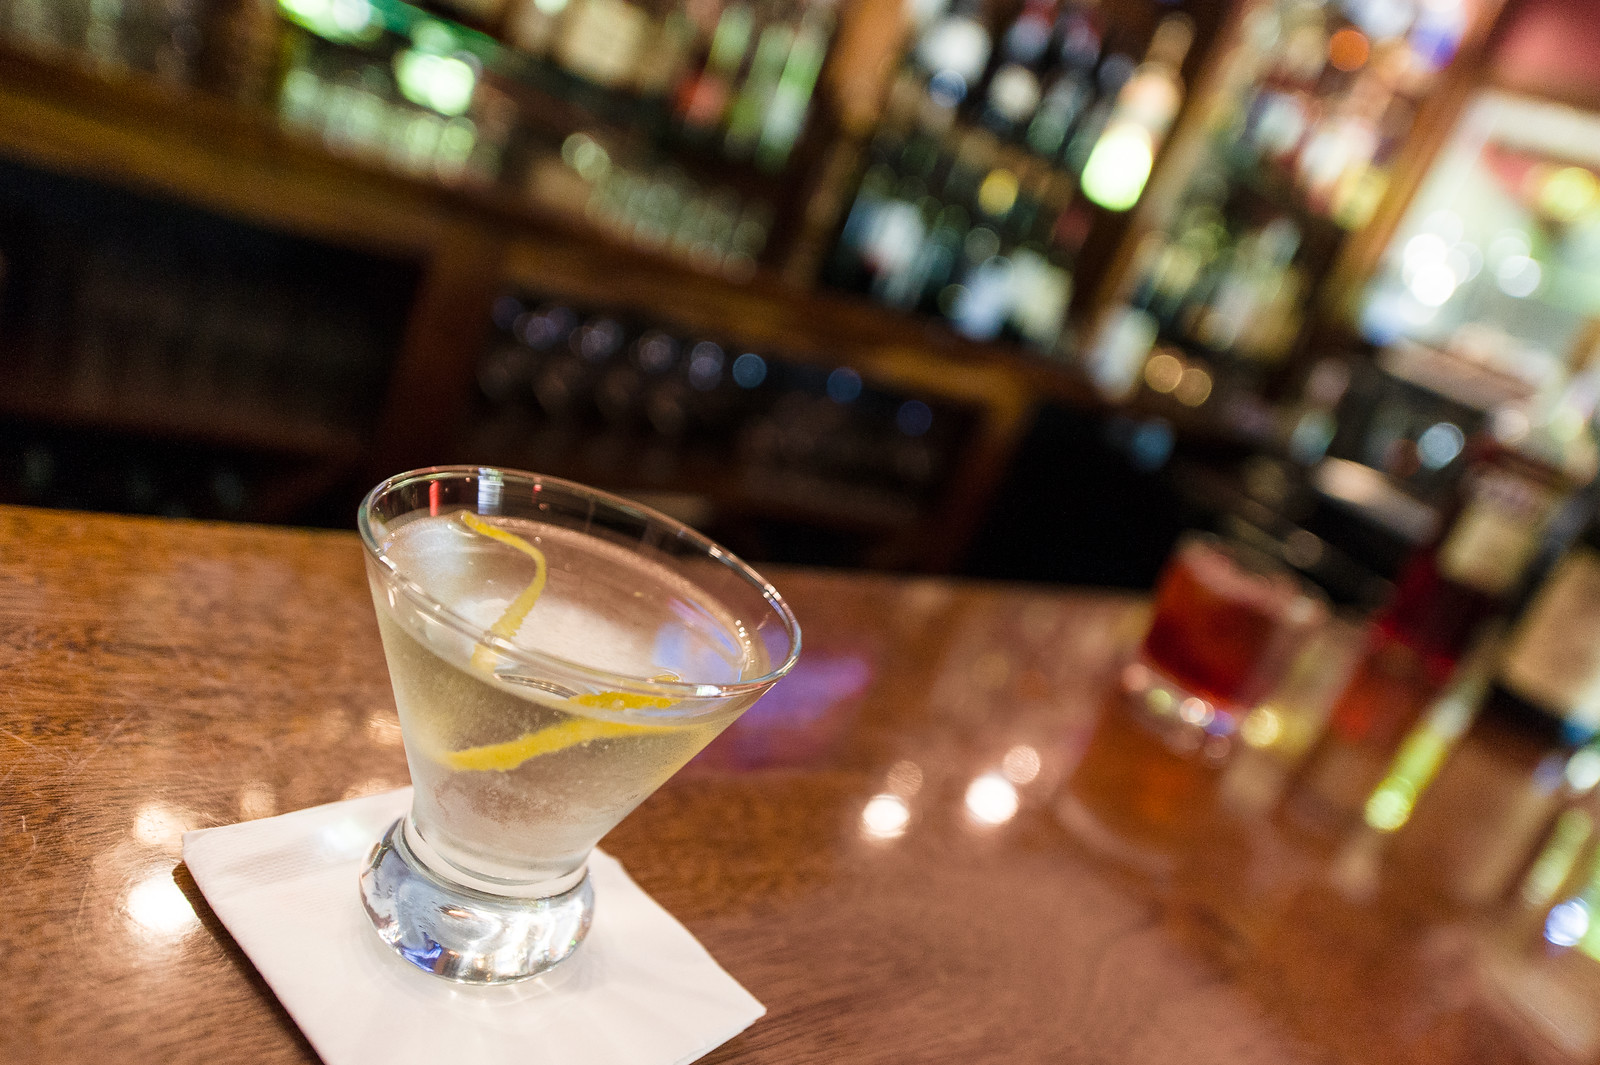 martini 08.21.15.jpg